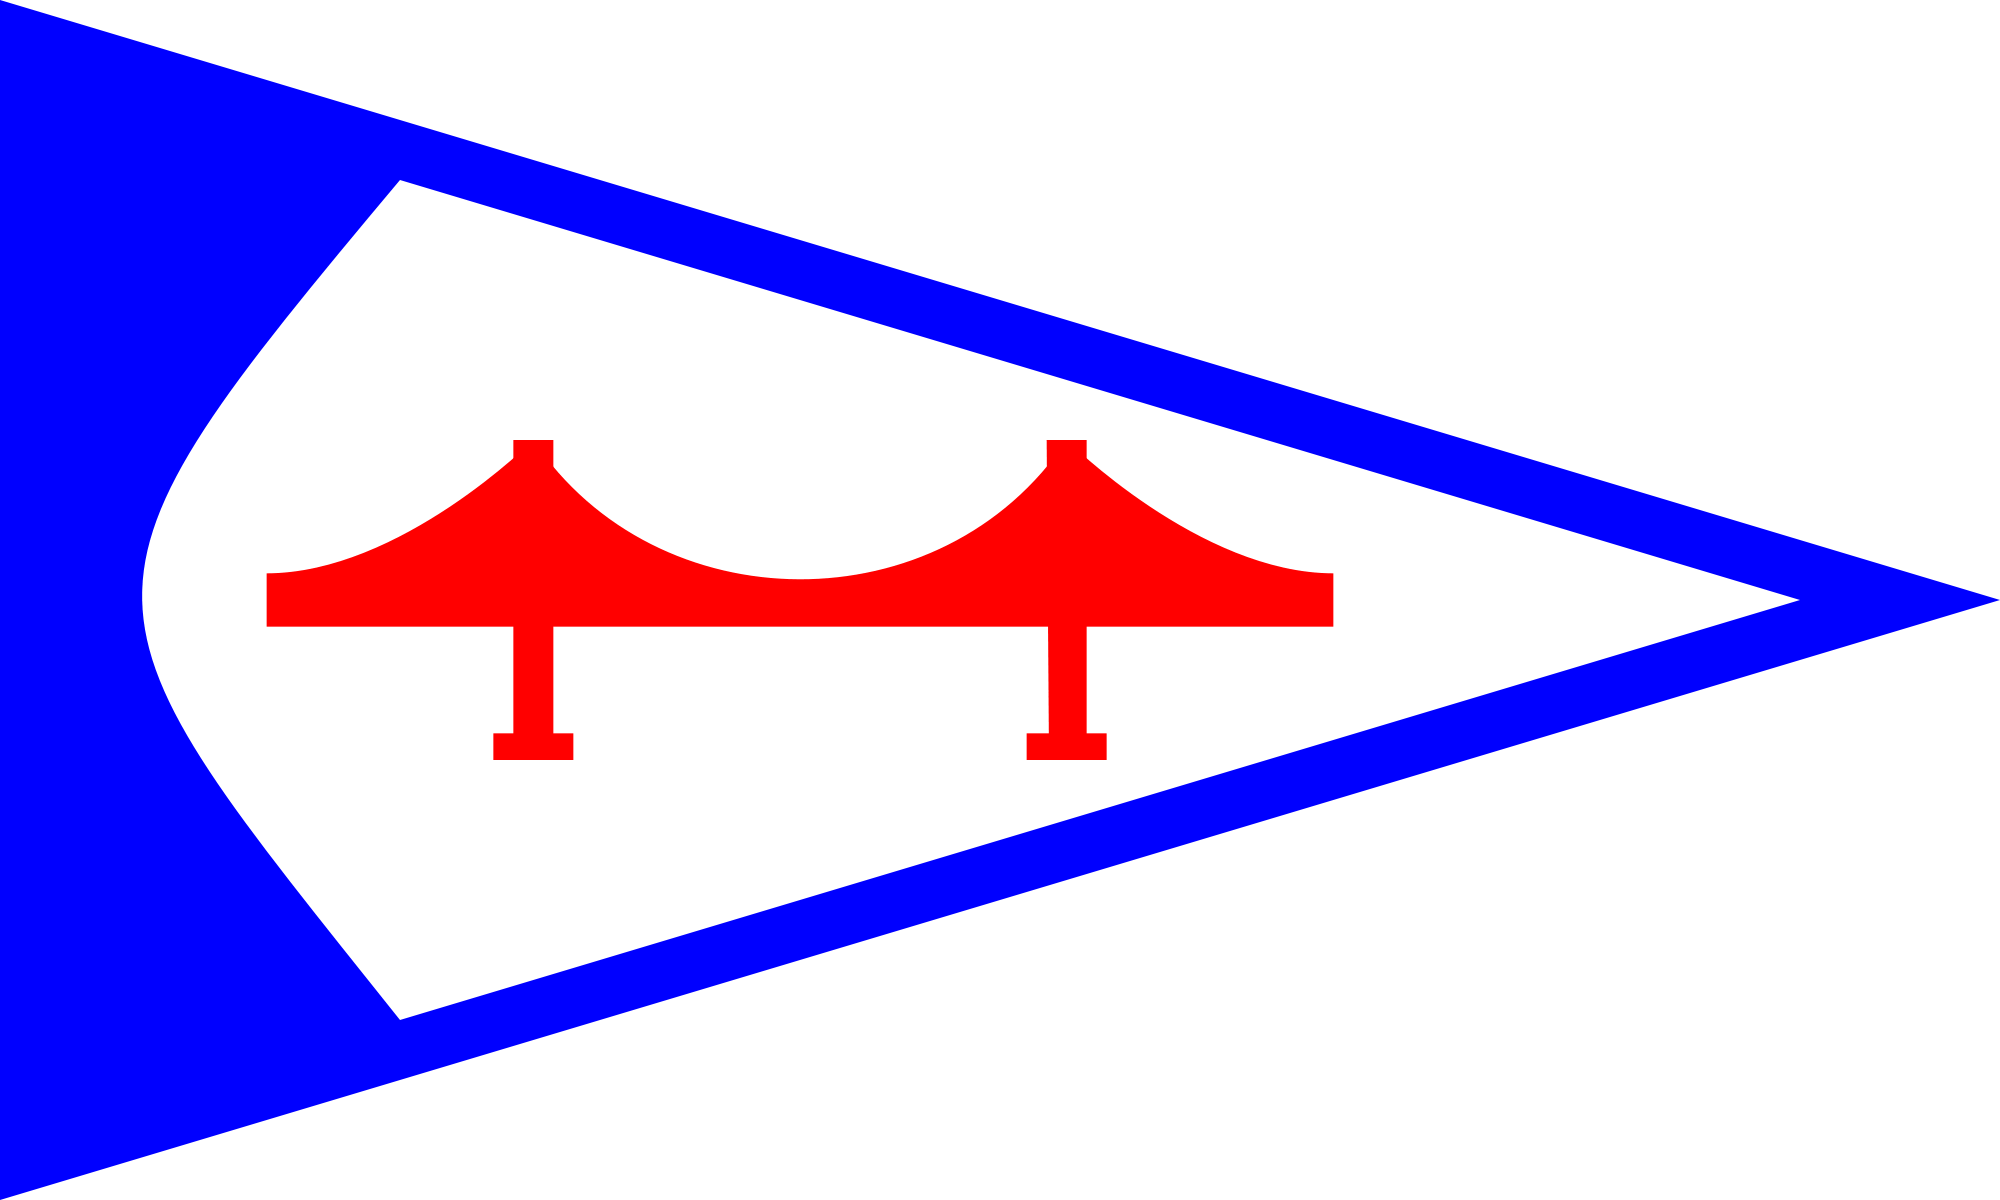 San Picture Bridge Coloring Francisco